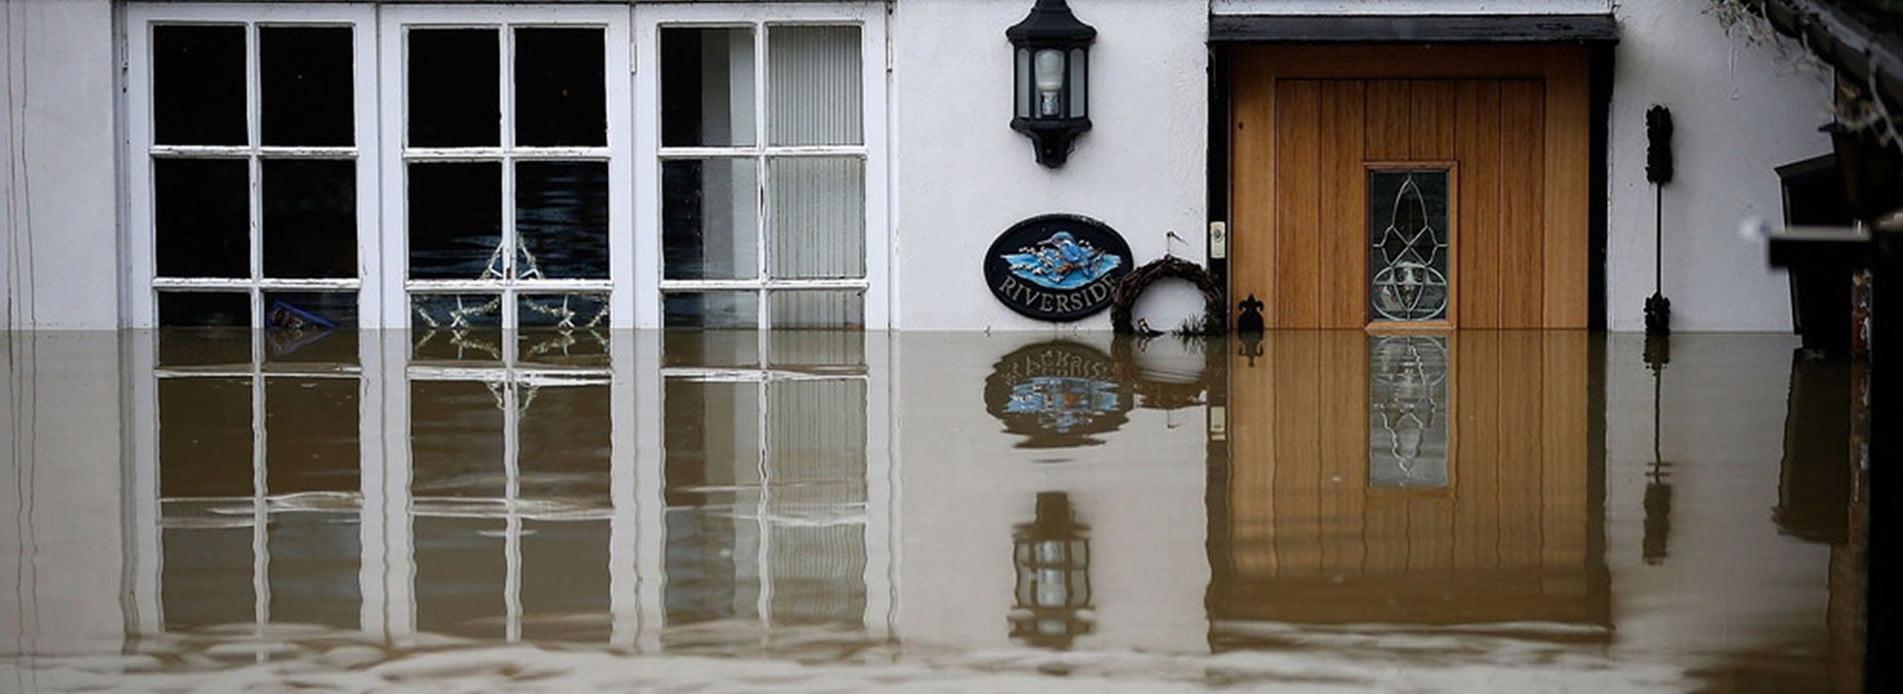 Flooded-home-headline-image